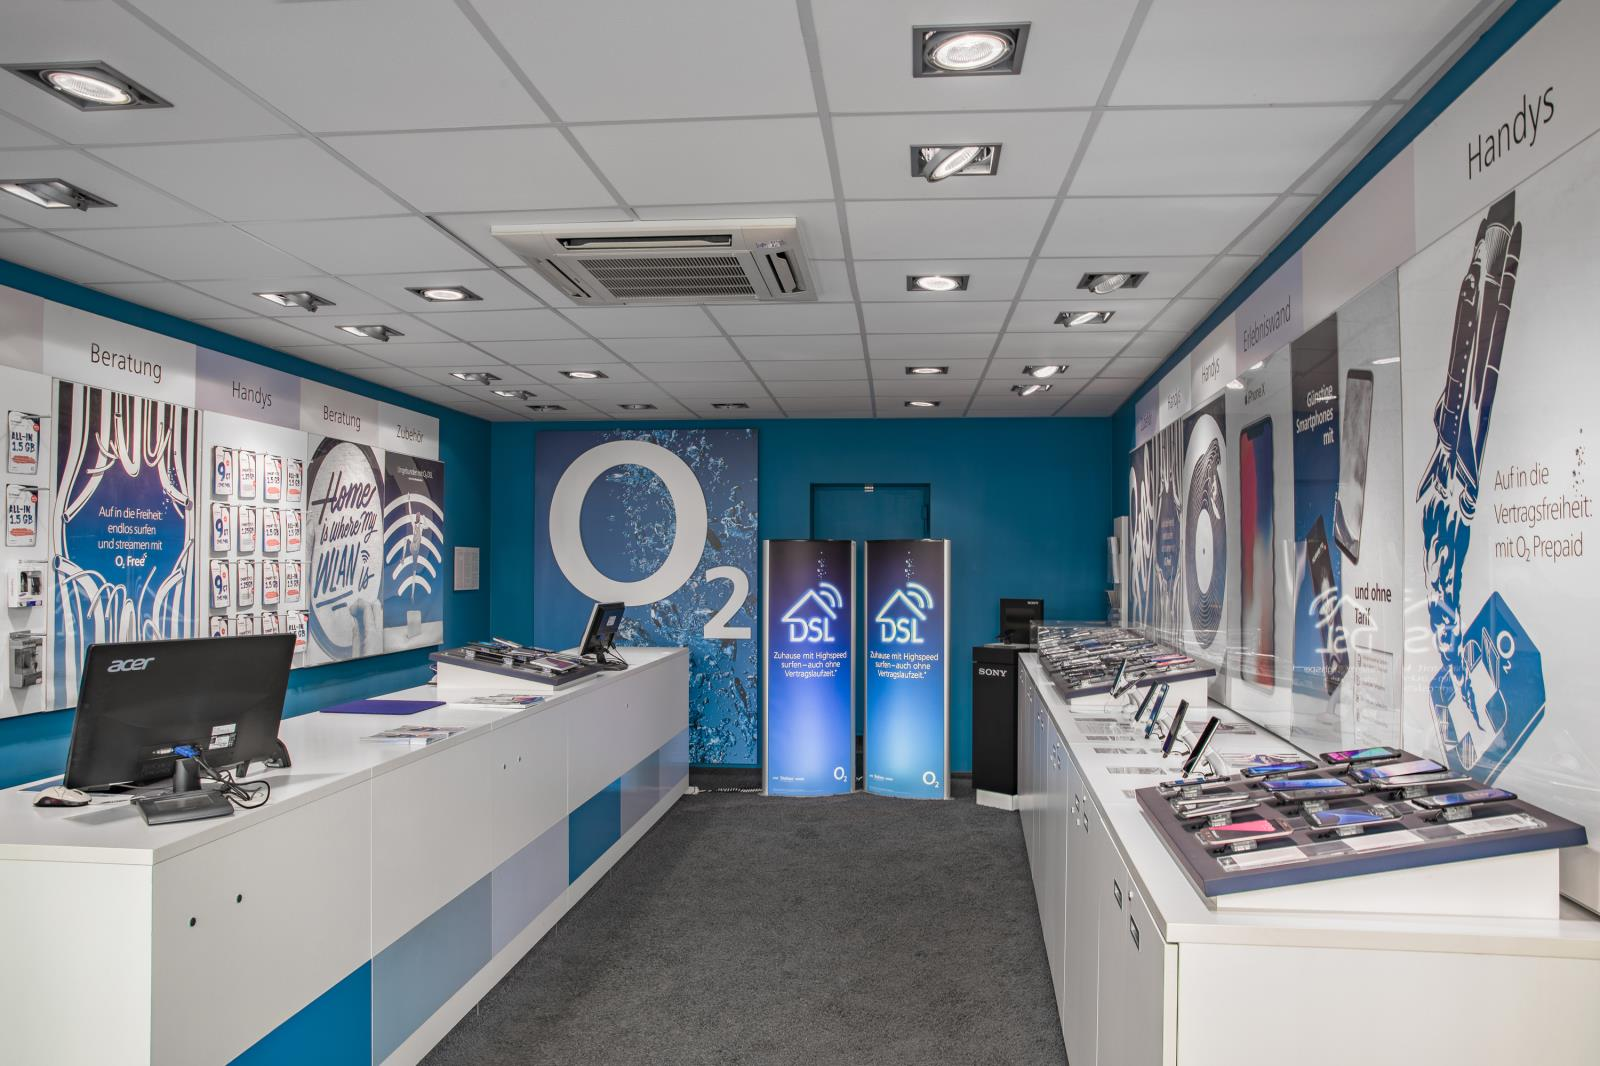 o2 Shop Landau